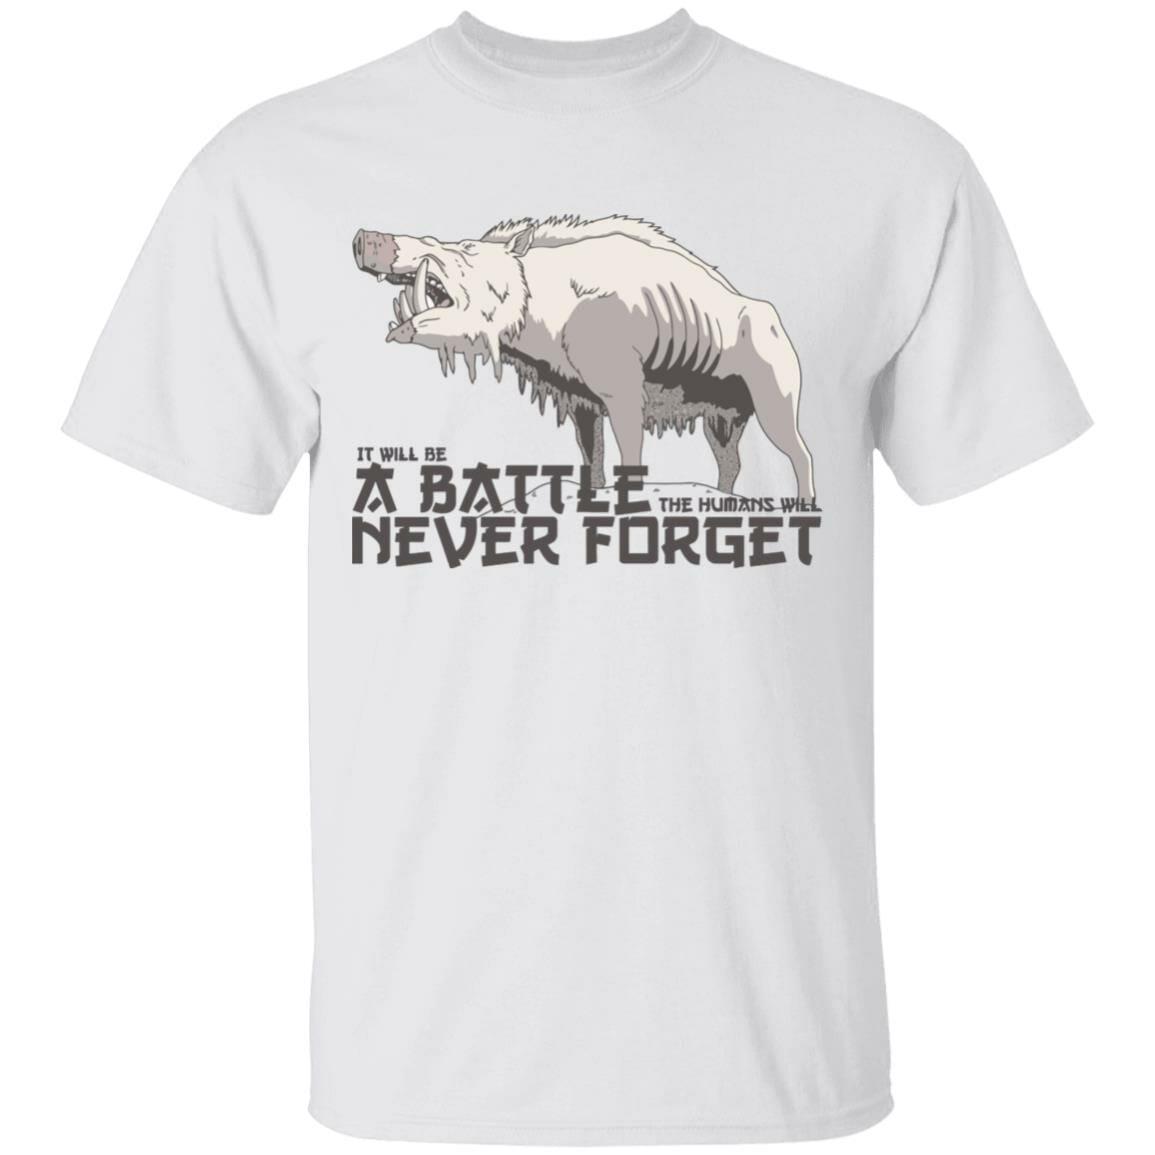 Princess Mononoke – A Battle Never Forget T Shirt